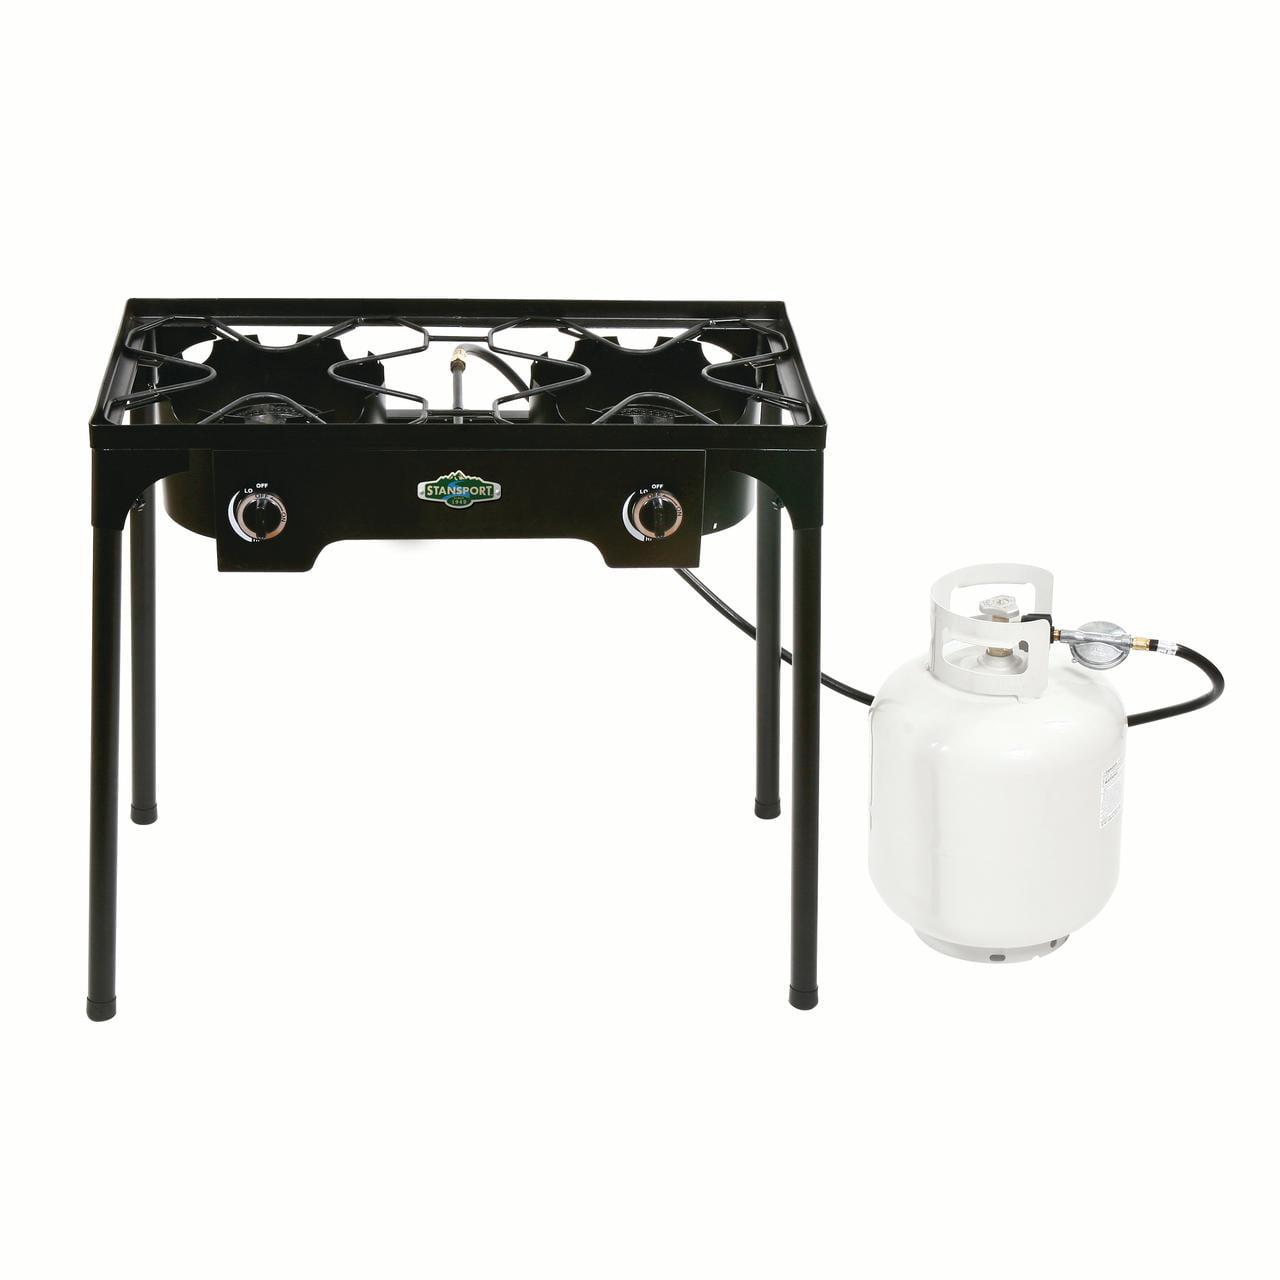 Stansport 2 Burner Cast Iron Stove with Stand - Walmart.com